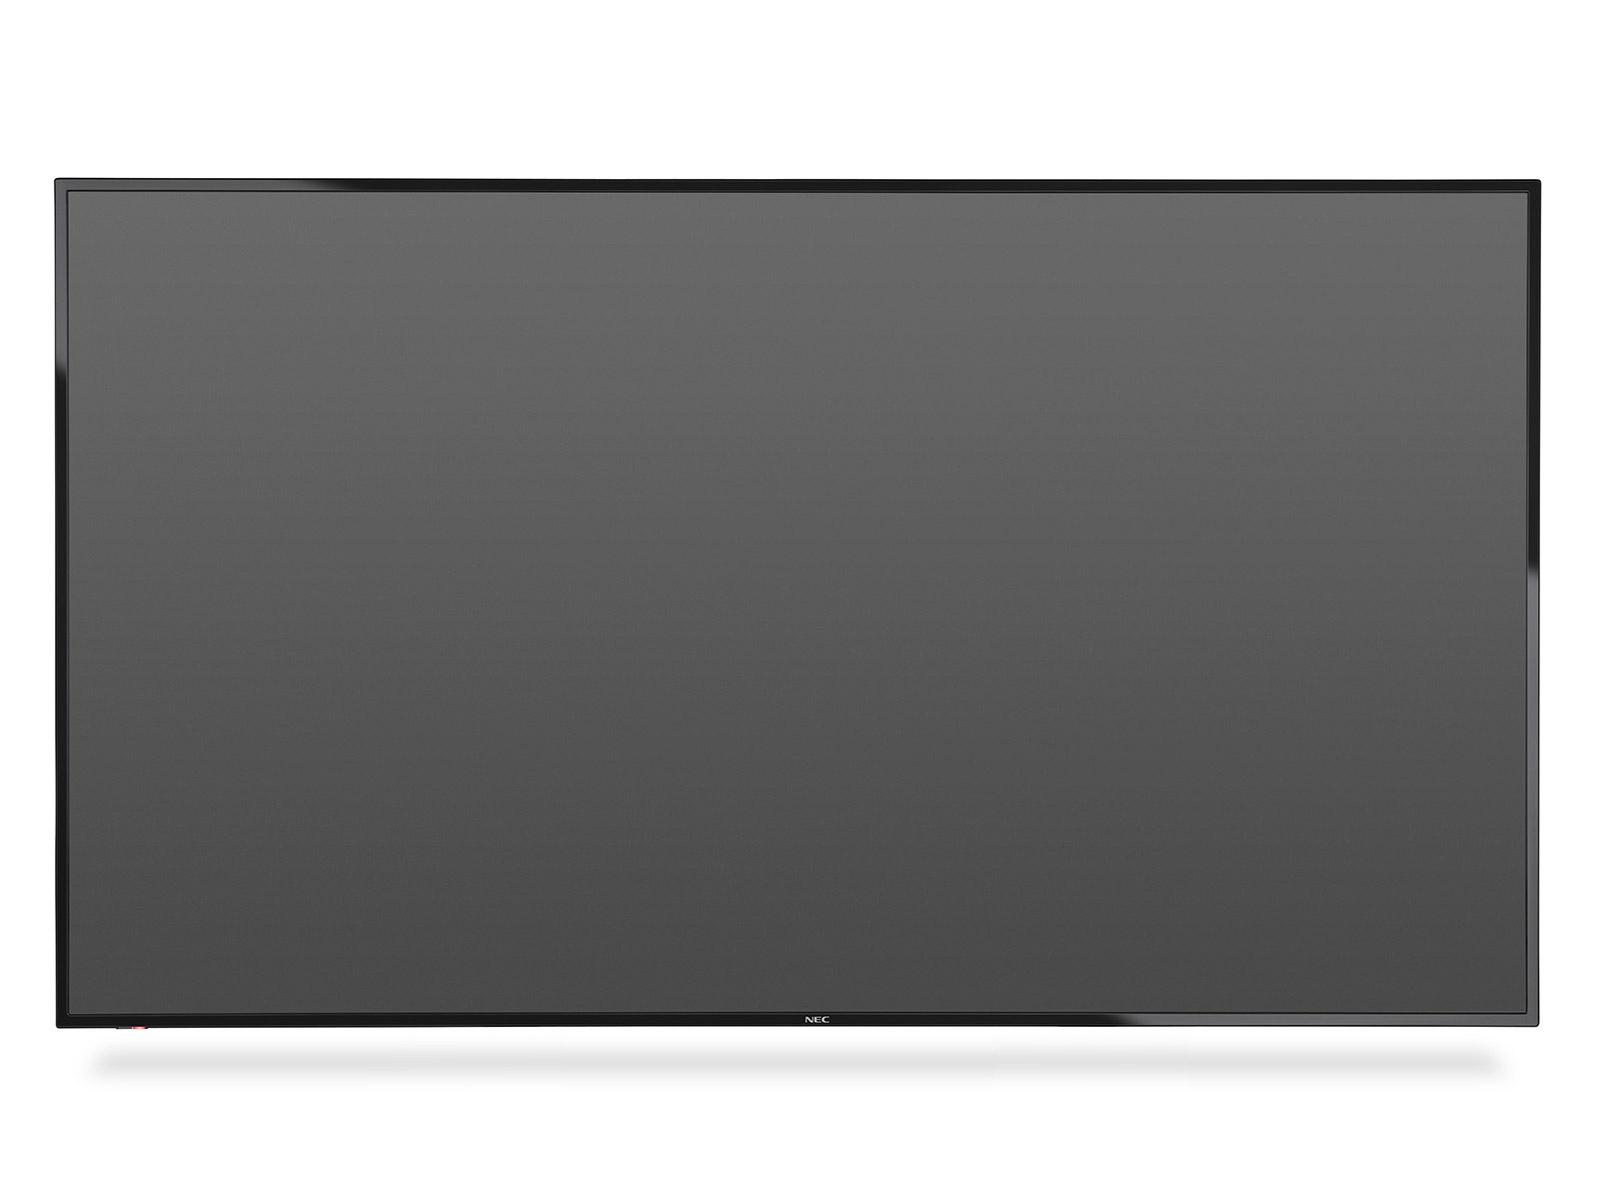 "MULTISYNC E656 DIGITAL SIGNAGE FLAT PANEL 65"" LED FULL HD NEGRO"